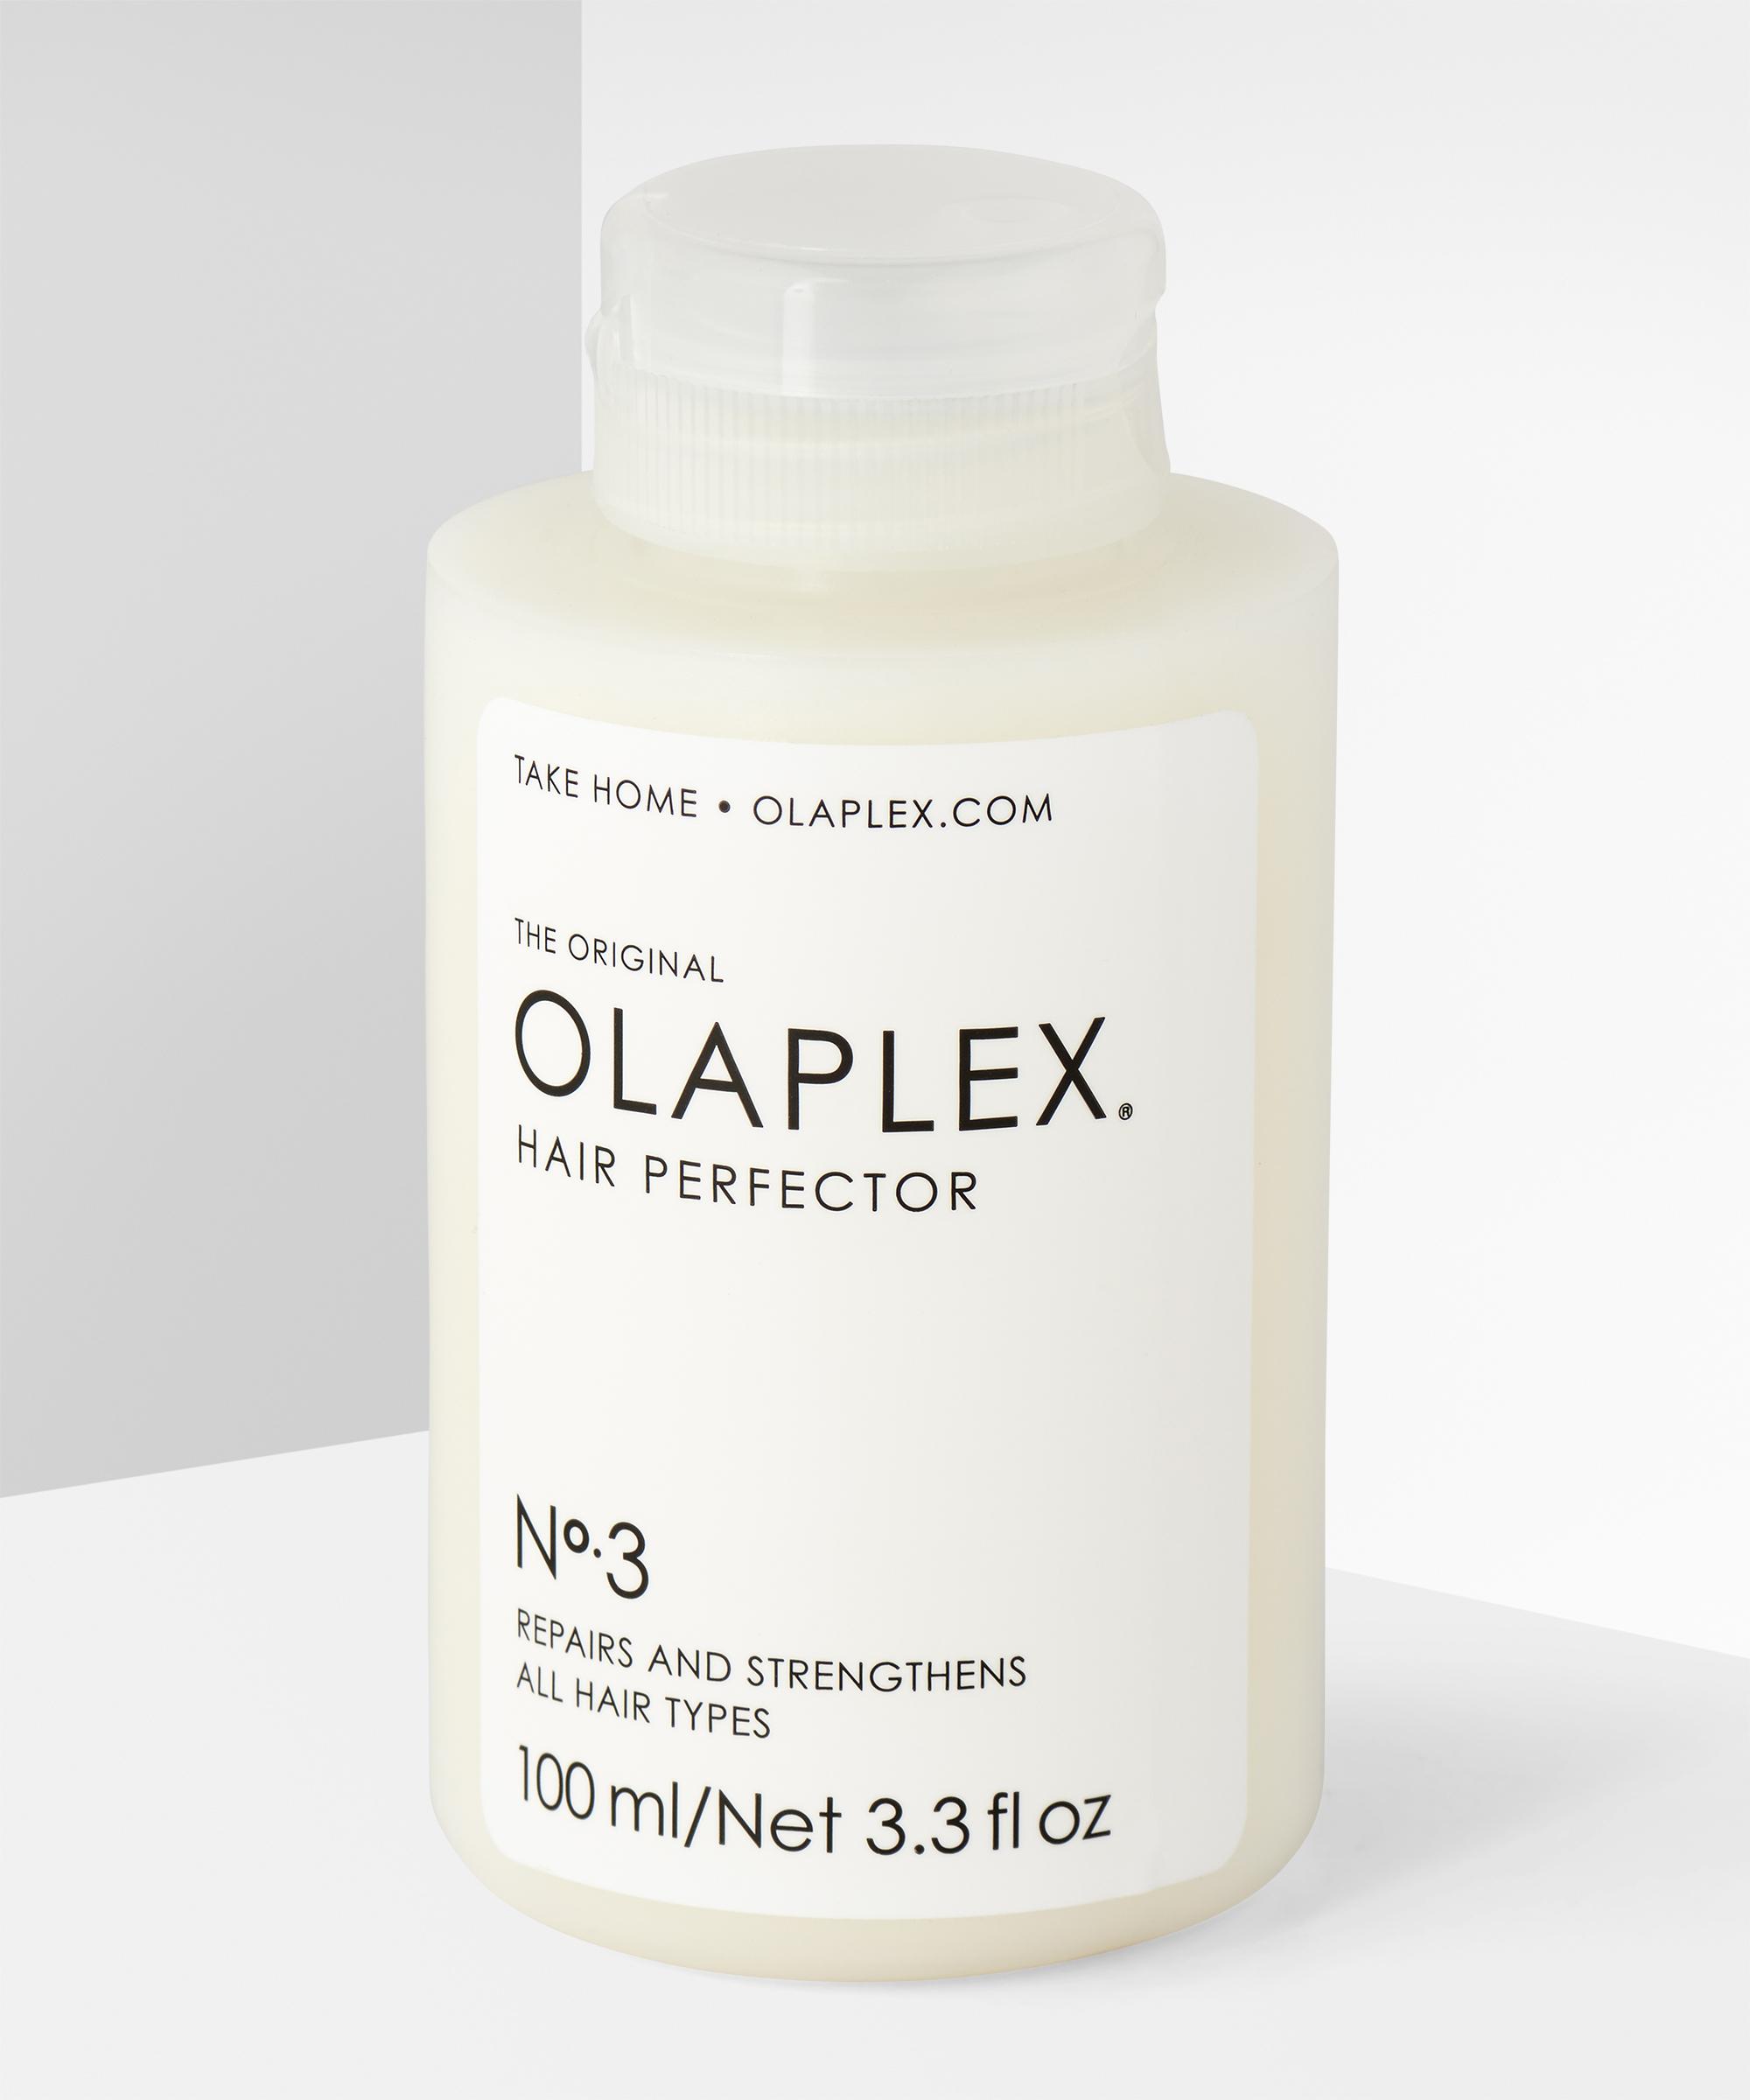 OLAPLEX Olaplex Hair Perfector No 3 at BEAUTY BAY